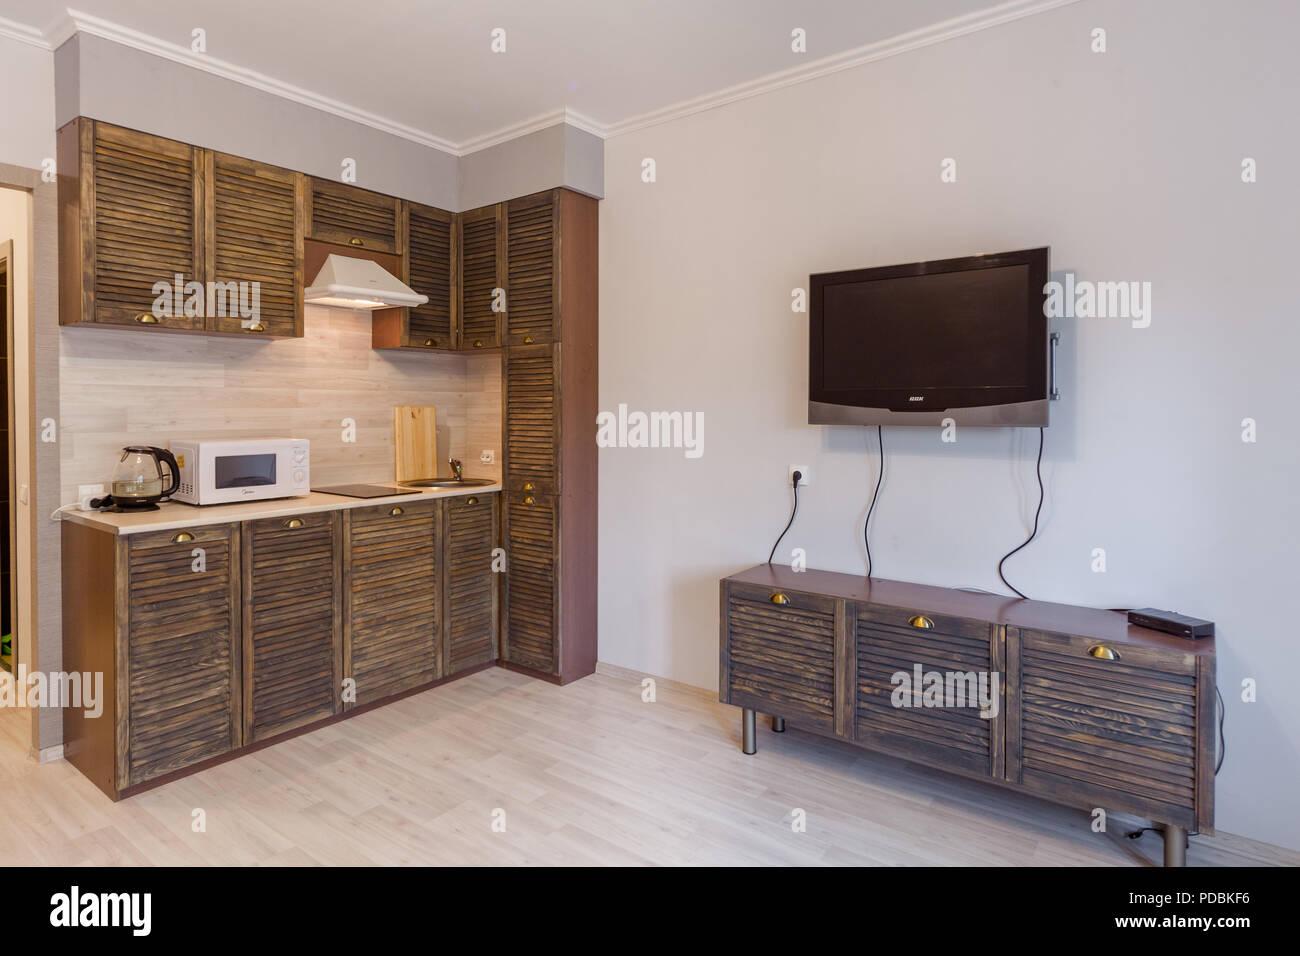 Small Studio Apartment Furniture Stock Photos & Small Studio ...